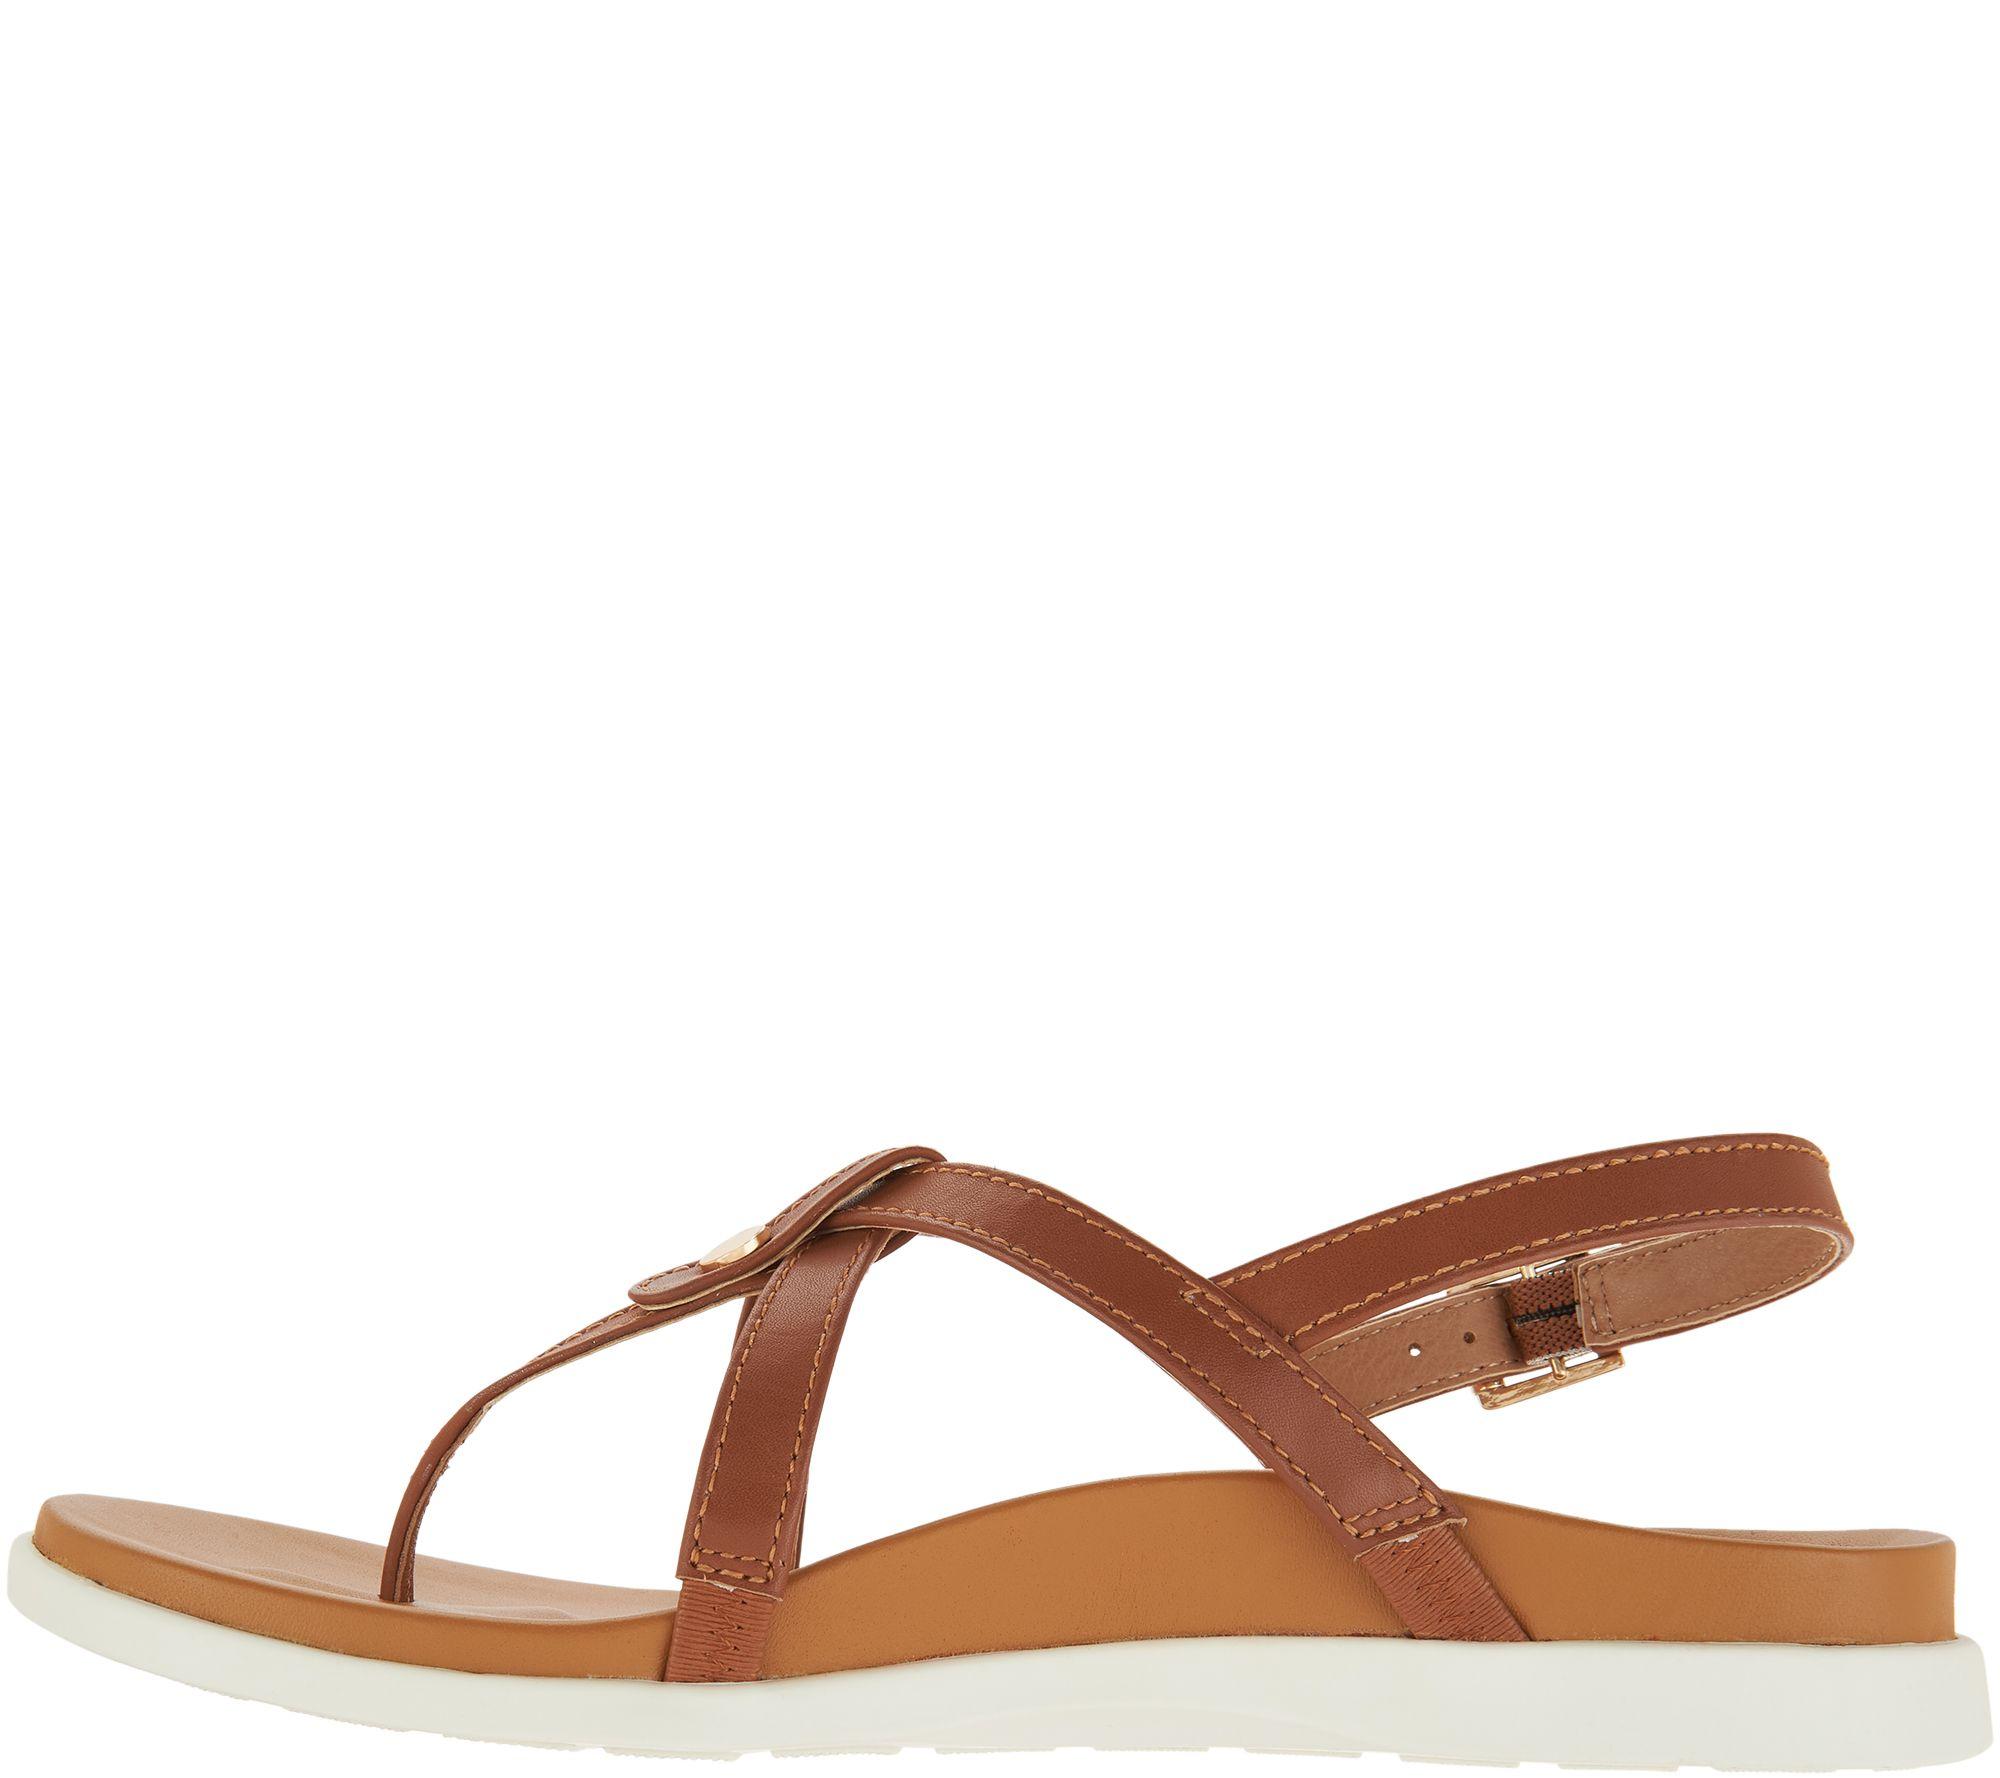 2d525ebaf07ab Vionic Leather Thong Back-Strap Sandals - Veranda - Page 1 — QVC.com